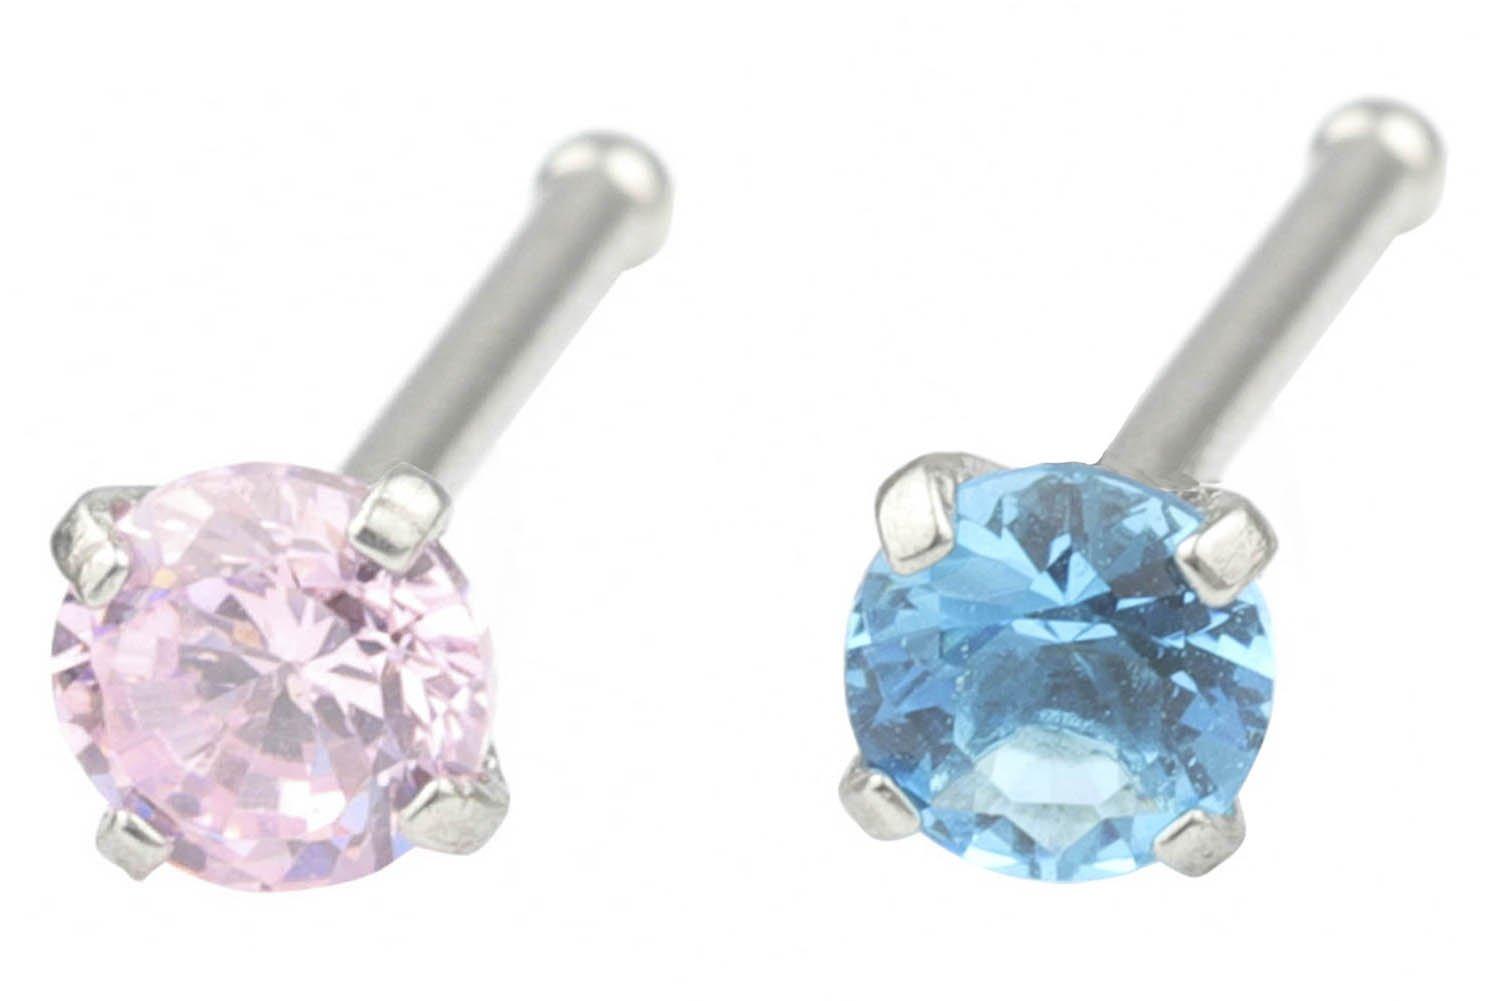 Du 1-8Pcs 18G 3mm Round/Heart Diamond Cz Nose Bone Studs Rings Pin Piercing Jewelry